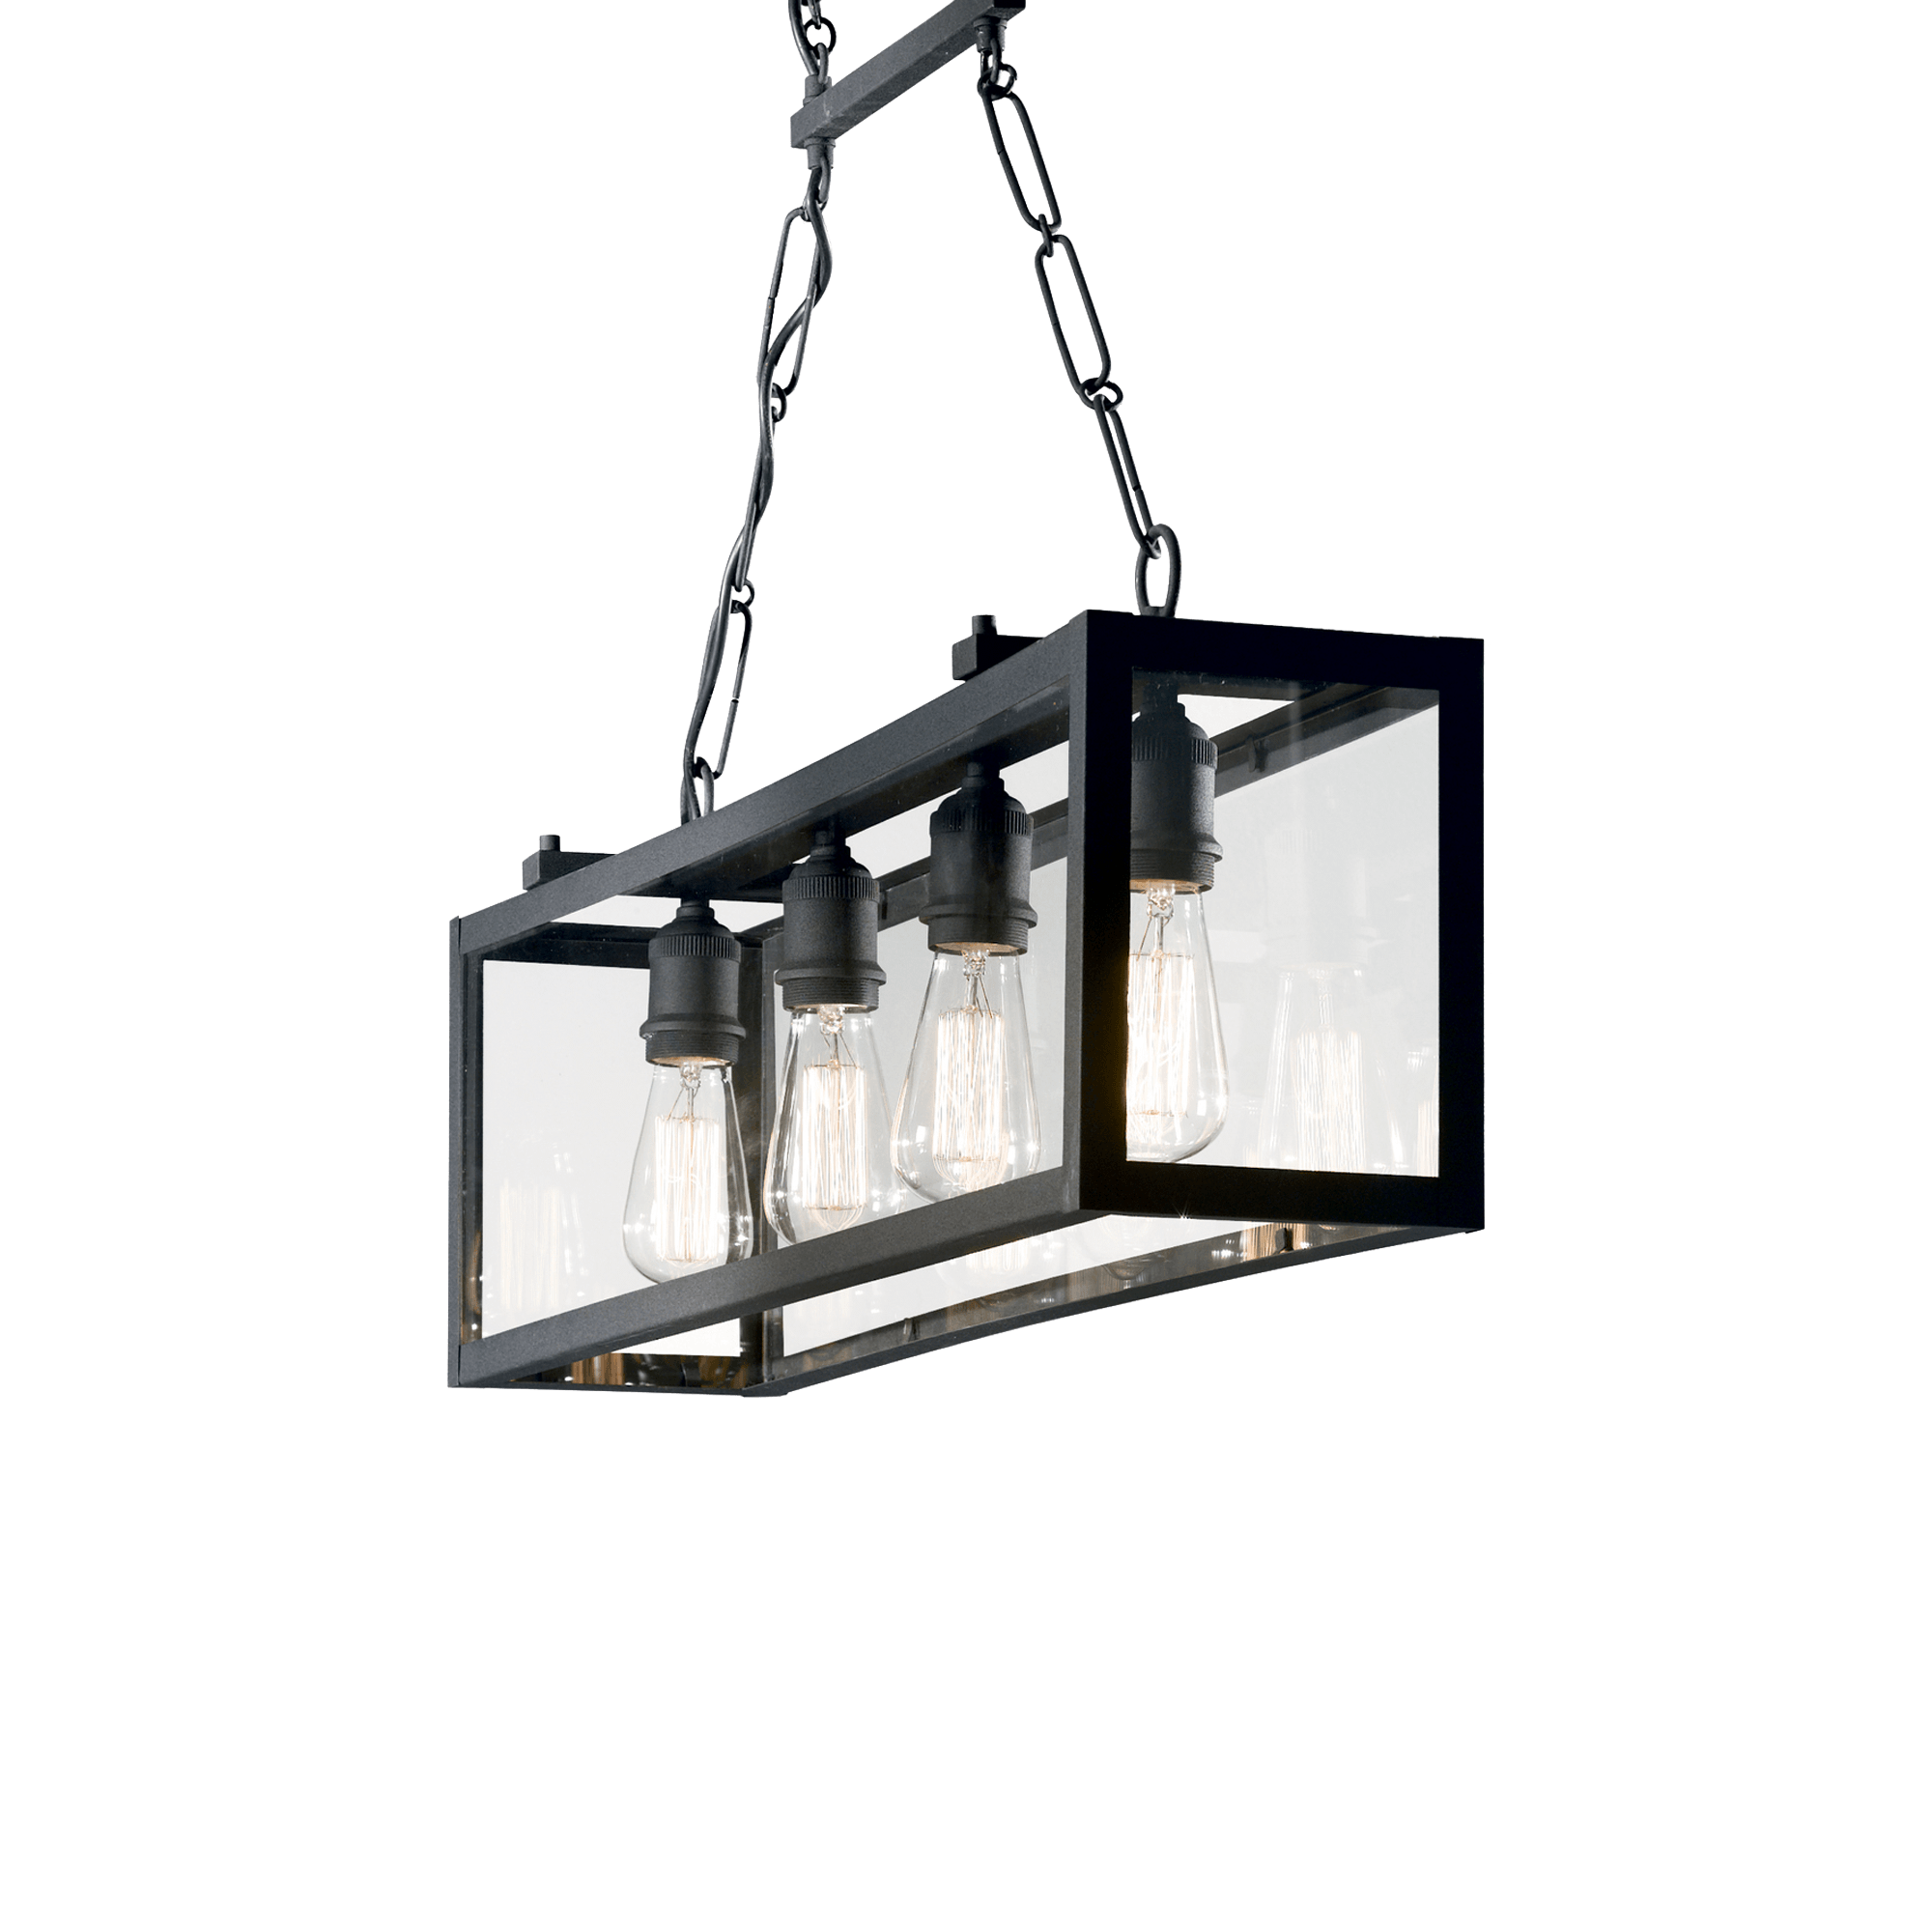 Ideal Lux 092942 Igor SP4 Nero lámpa függeszték